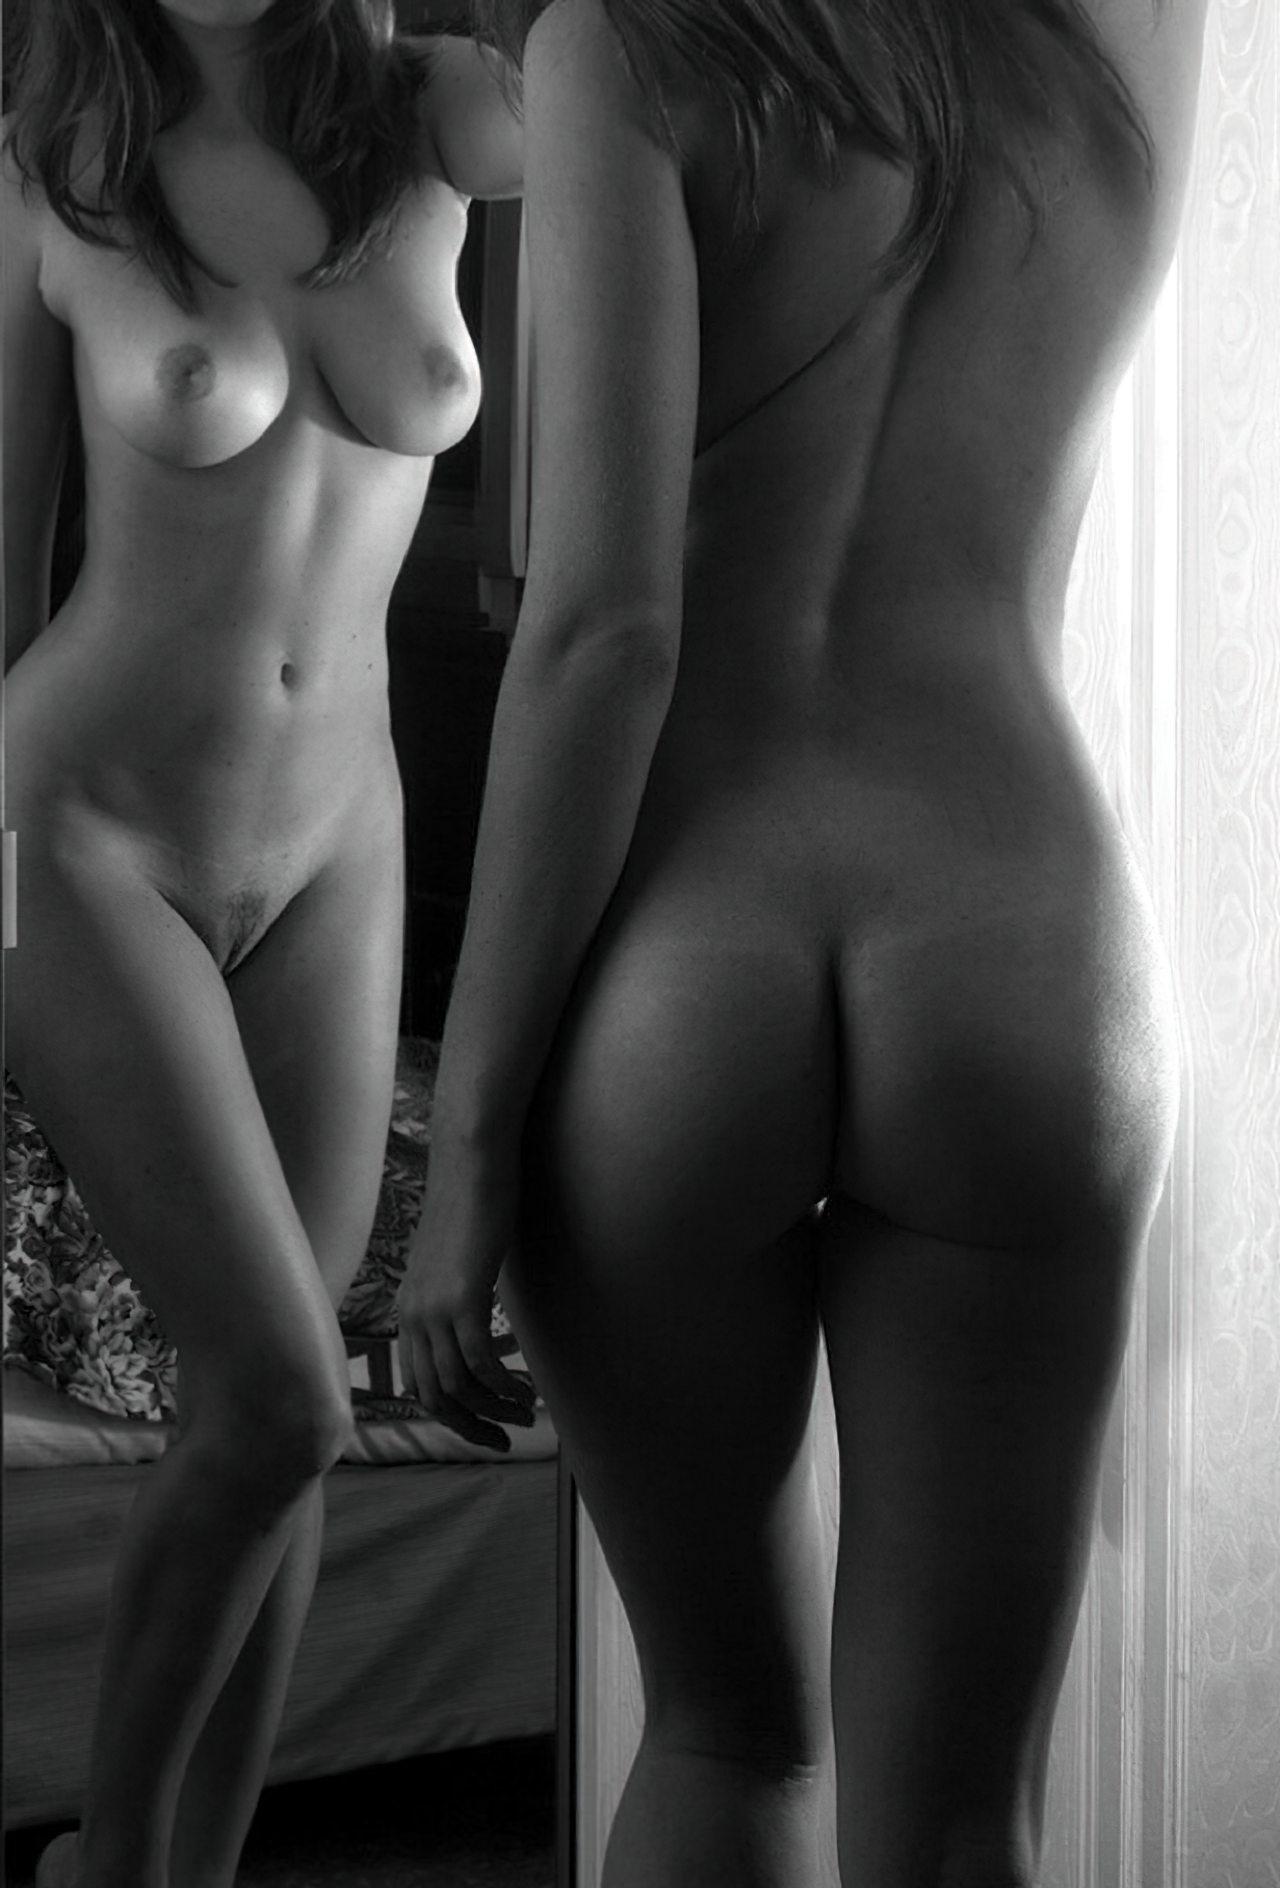 Mulheres Despidas (8)